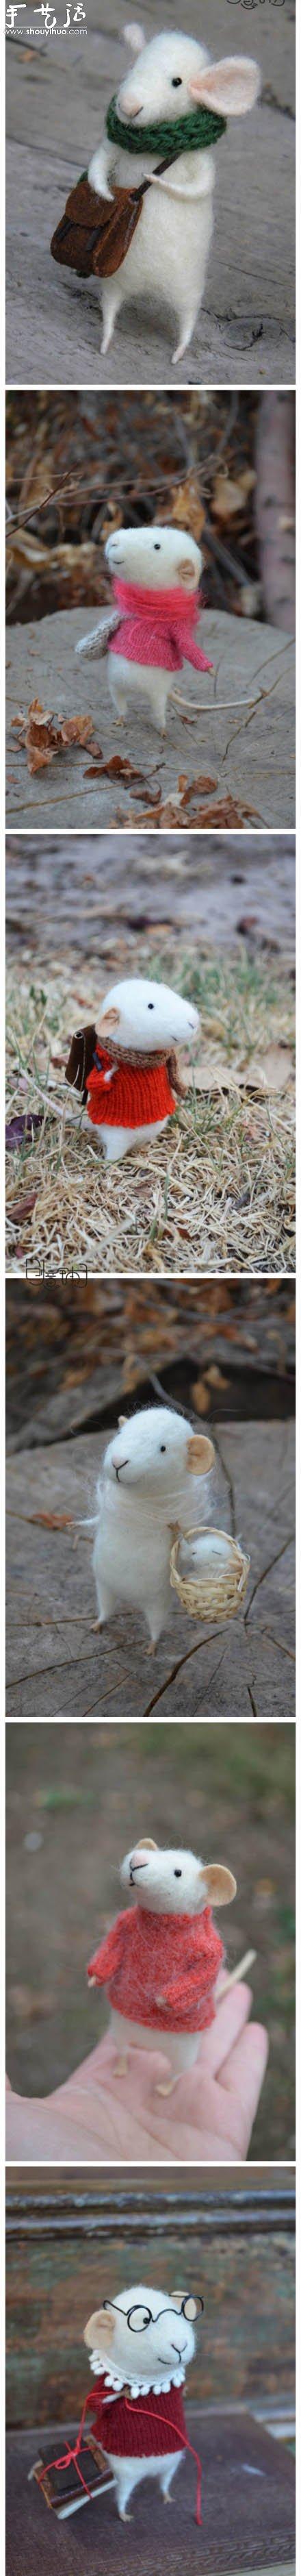 羊毛毡制作的可爱精灵鼠小弟 -  www.shouyihuo.com